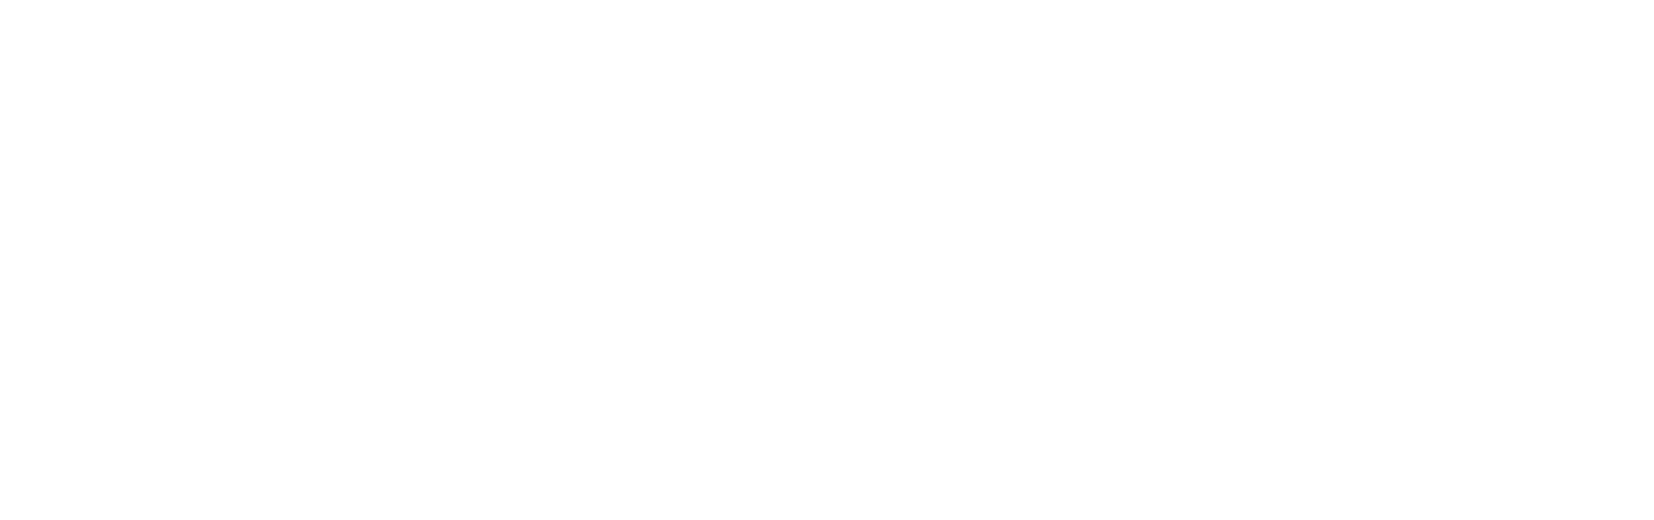 logo sản phẩm